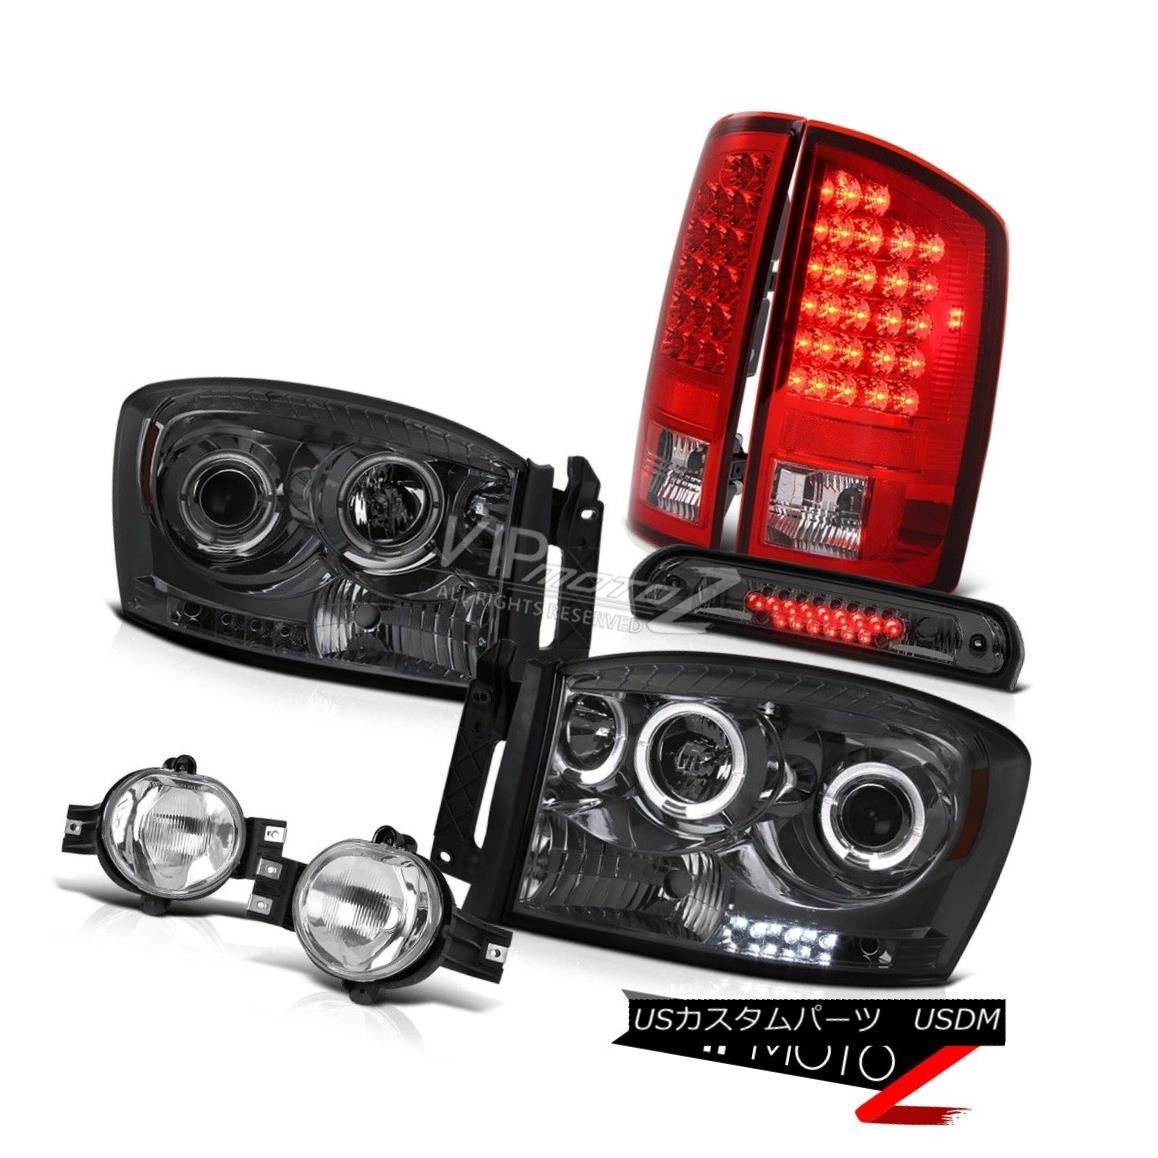 Set of Euro Clear Halo Headlights w// Park Signal Light for 2001-2006 GMC Denali